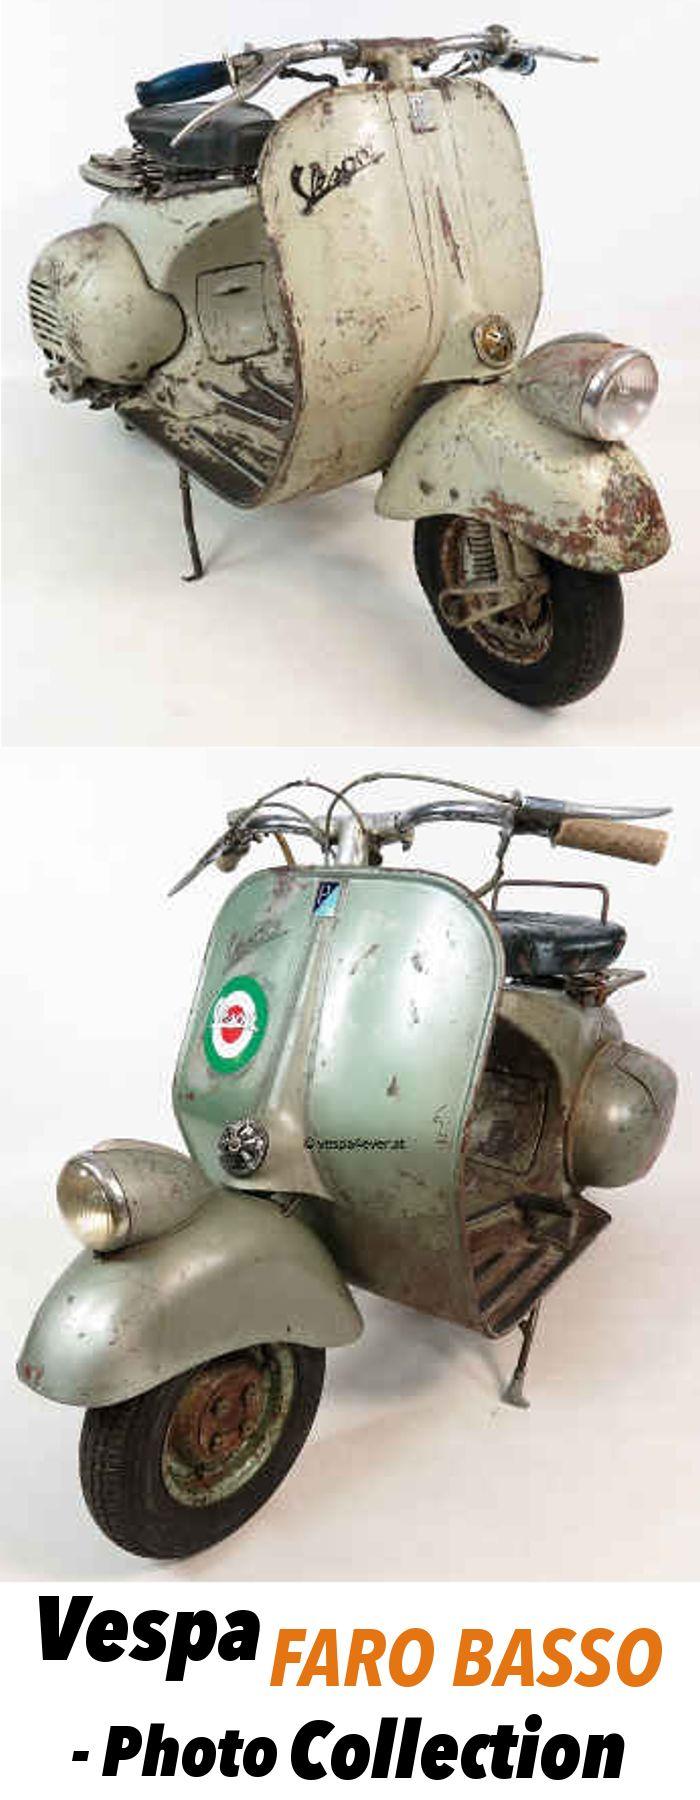 Vespa Faro Basso Vintage Scooters